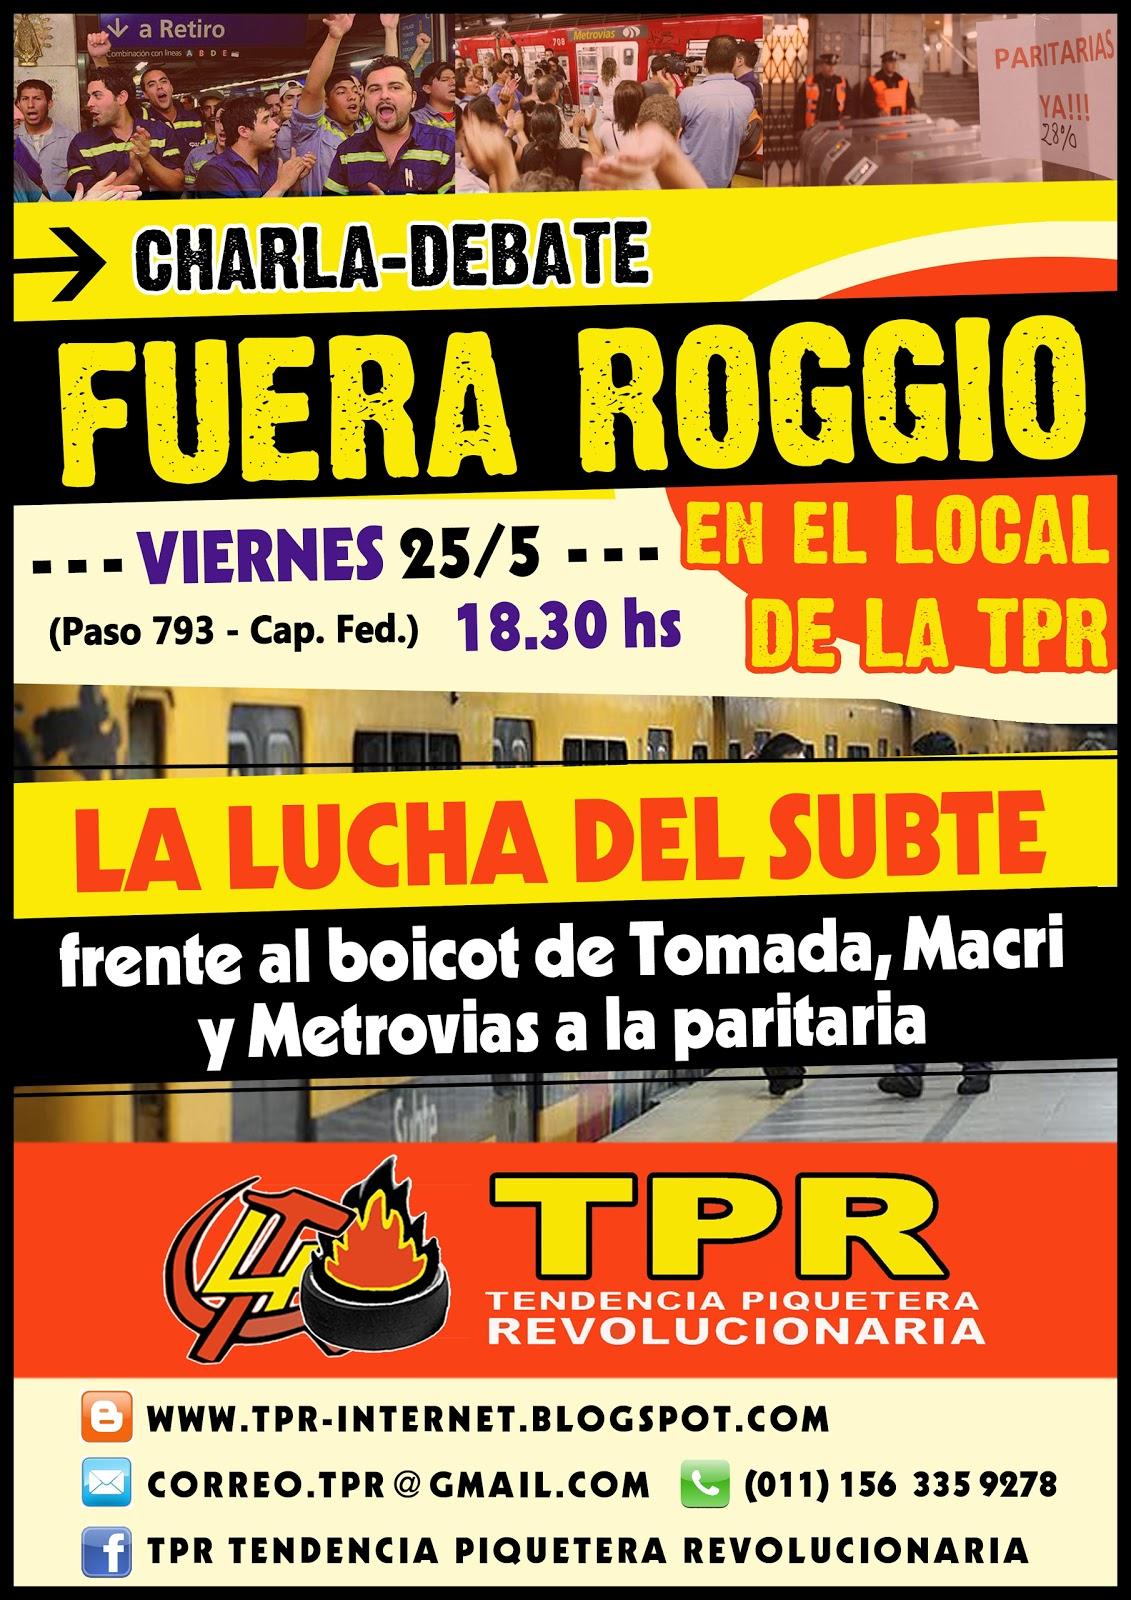 http://2.bp.blogspot.com/-473XKjzQW7g/T7lznR_JAoI/AAAAAAAAA2Y/fXwBDB69hxo/s1600/12_05_20+FLyer+Charla+Subte+Fuera+Roggio.jpg